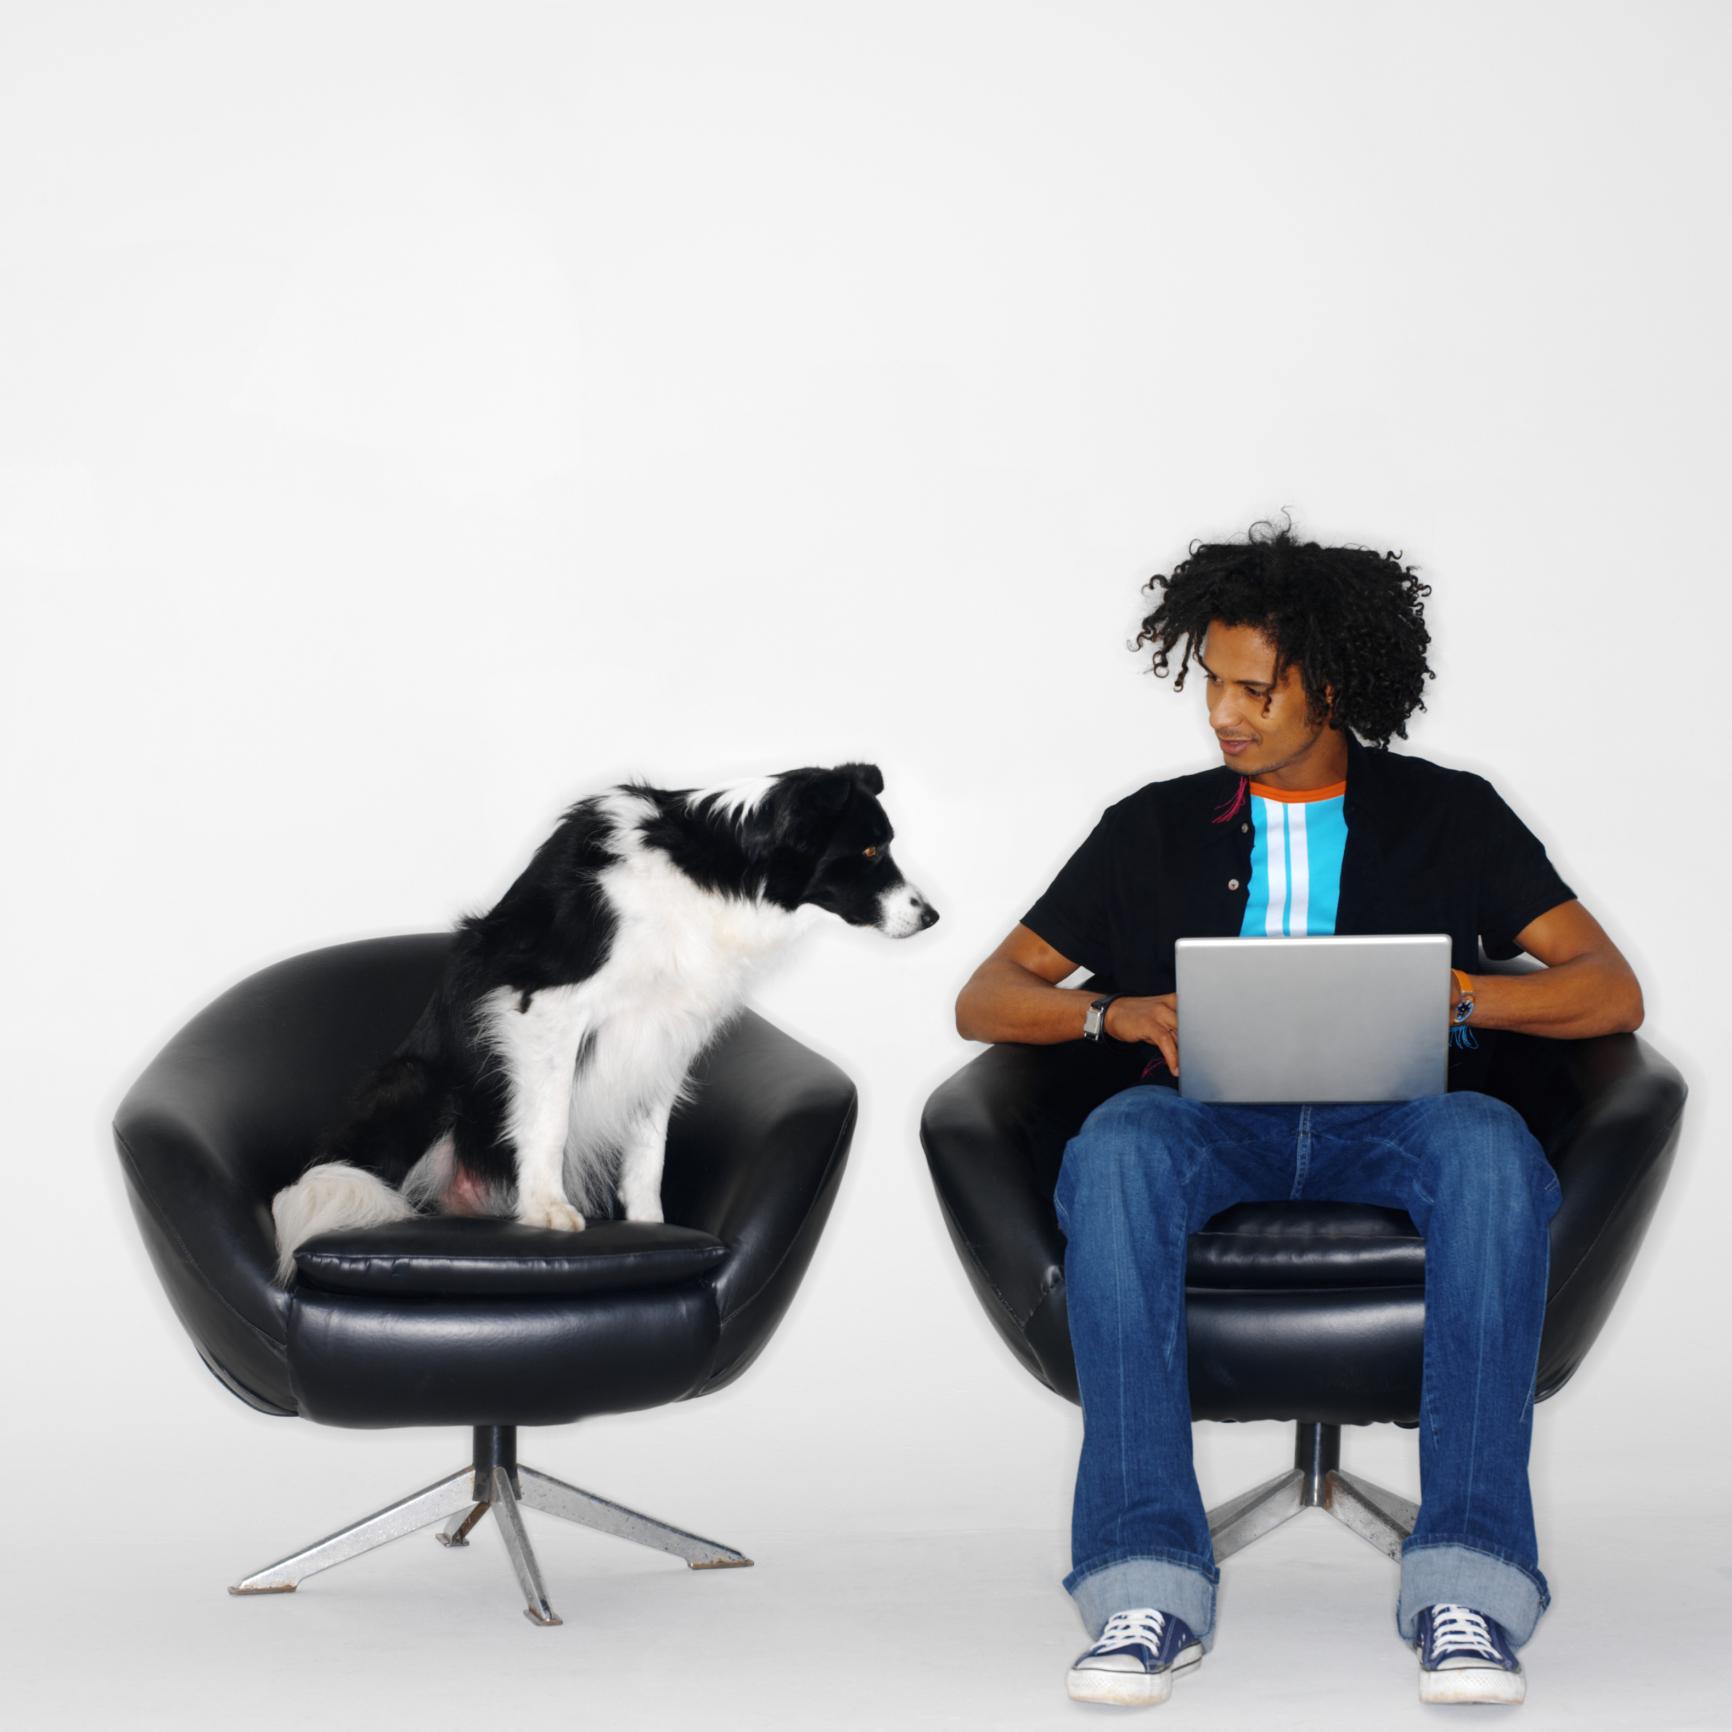 trae tu perro al trabajo